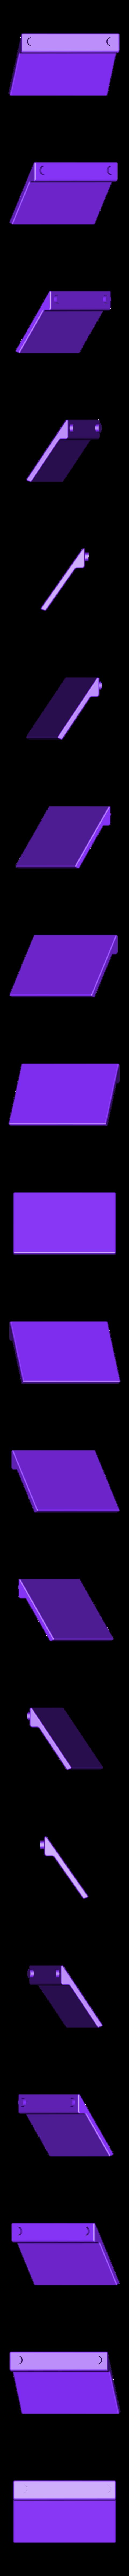 logo_TOTAL_70_pied_orange.STL Download free STL file TOTAL logo 1970 • Template to 3D print, lulu3Dbuilder